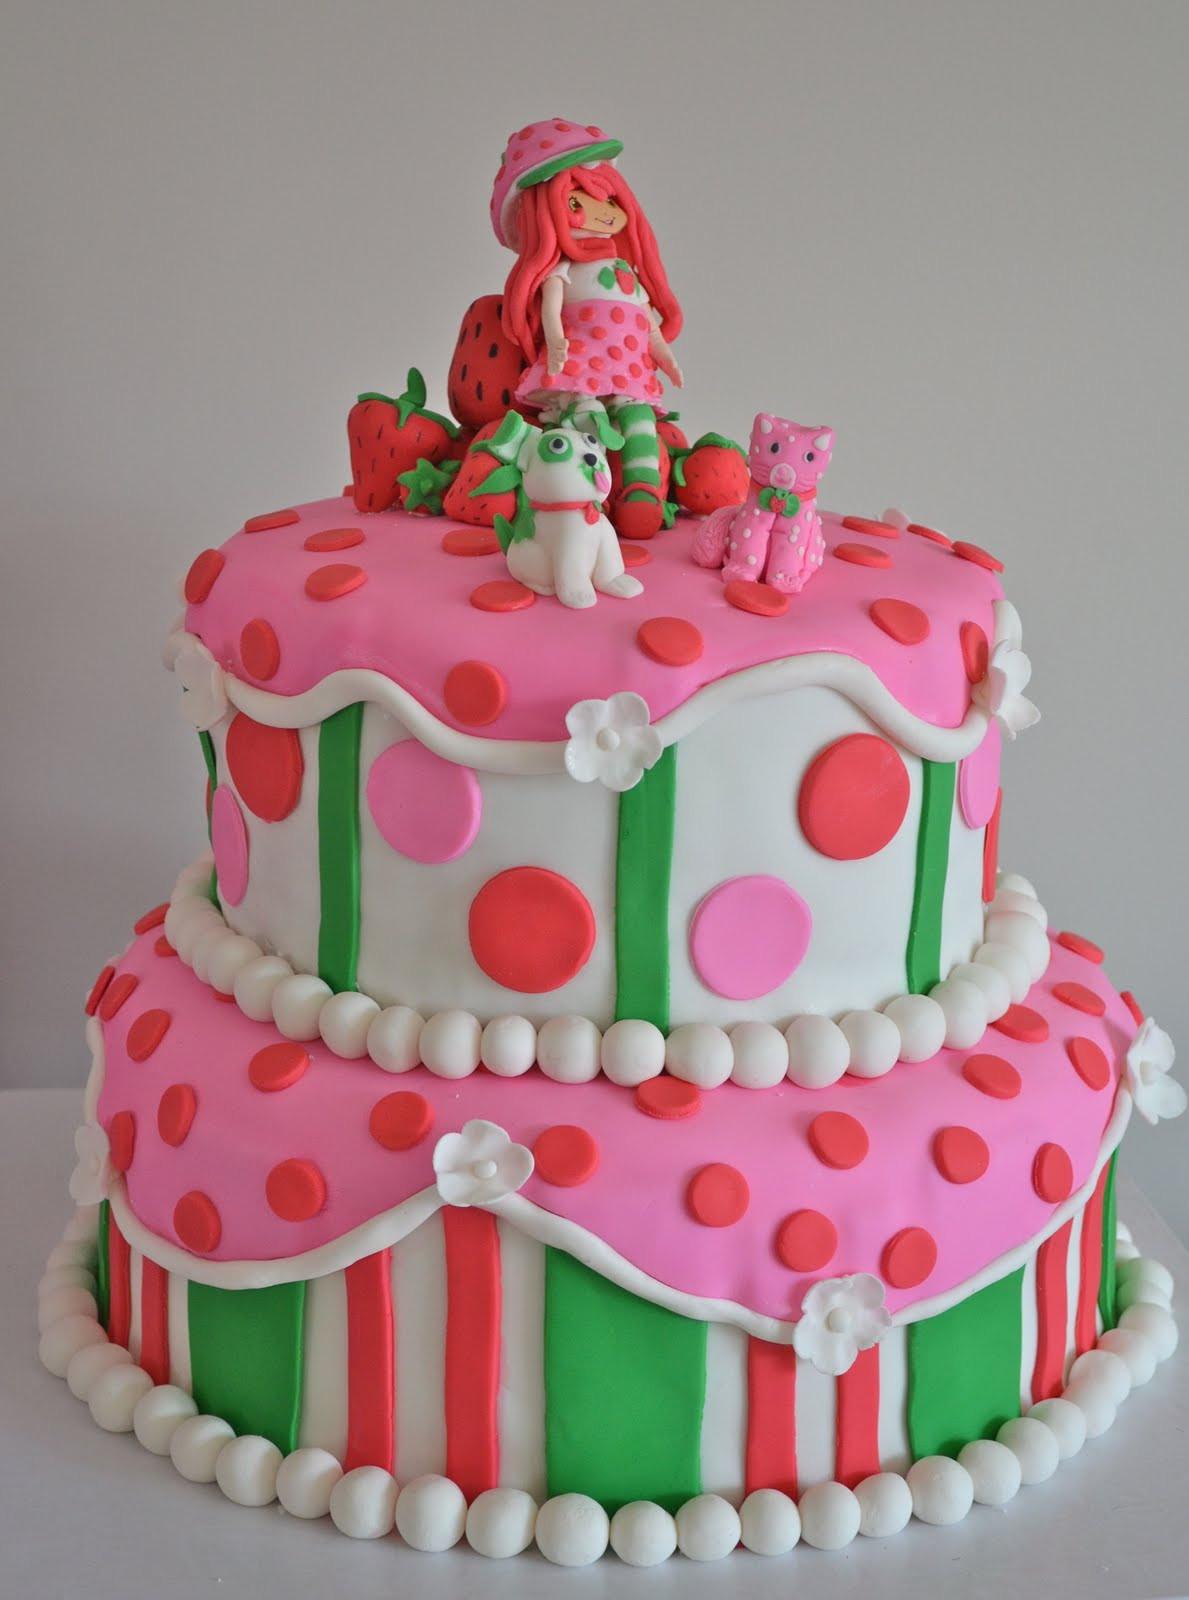 Strawberry Shortcake Cake  Emily s Custom Bakeshop Kallie s Strawberry Shortcake Cake